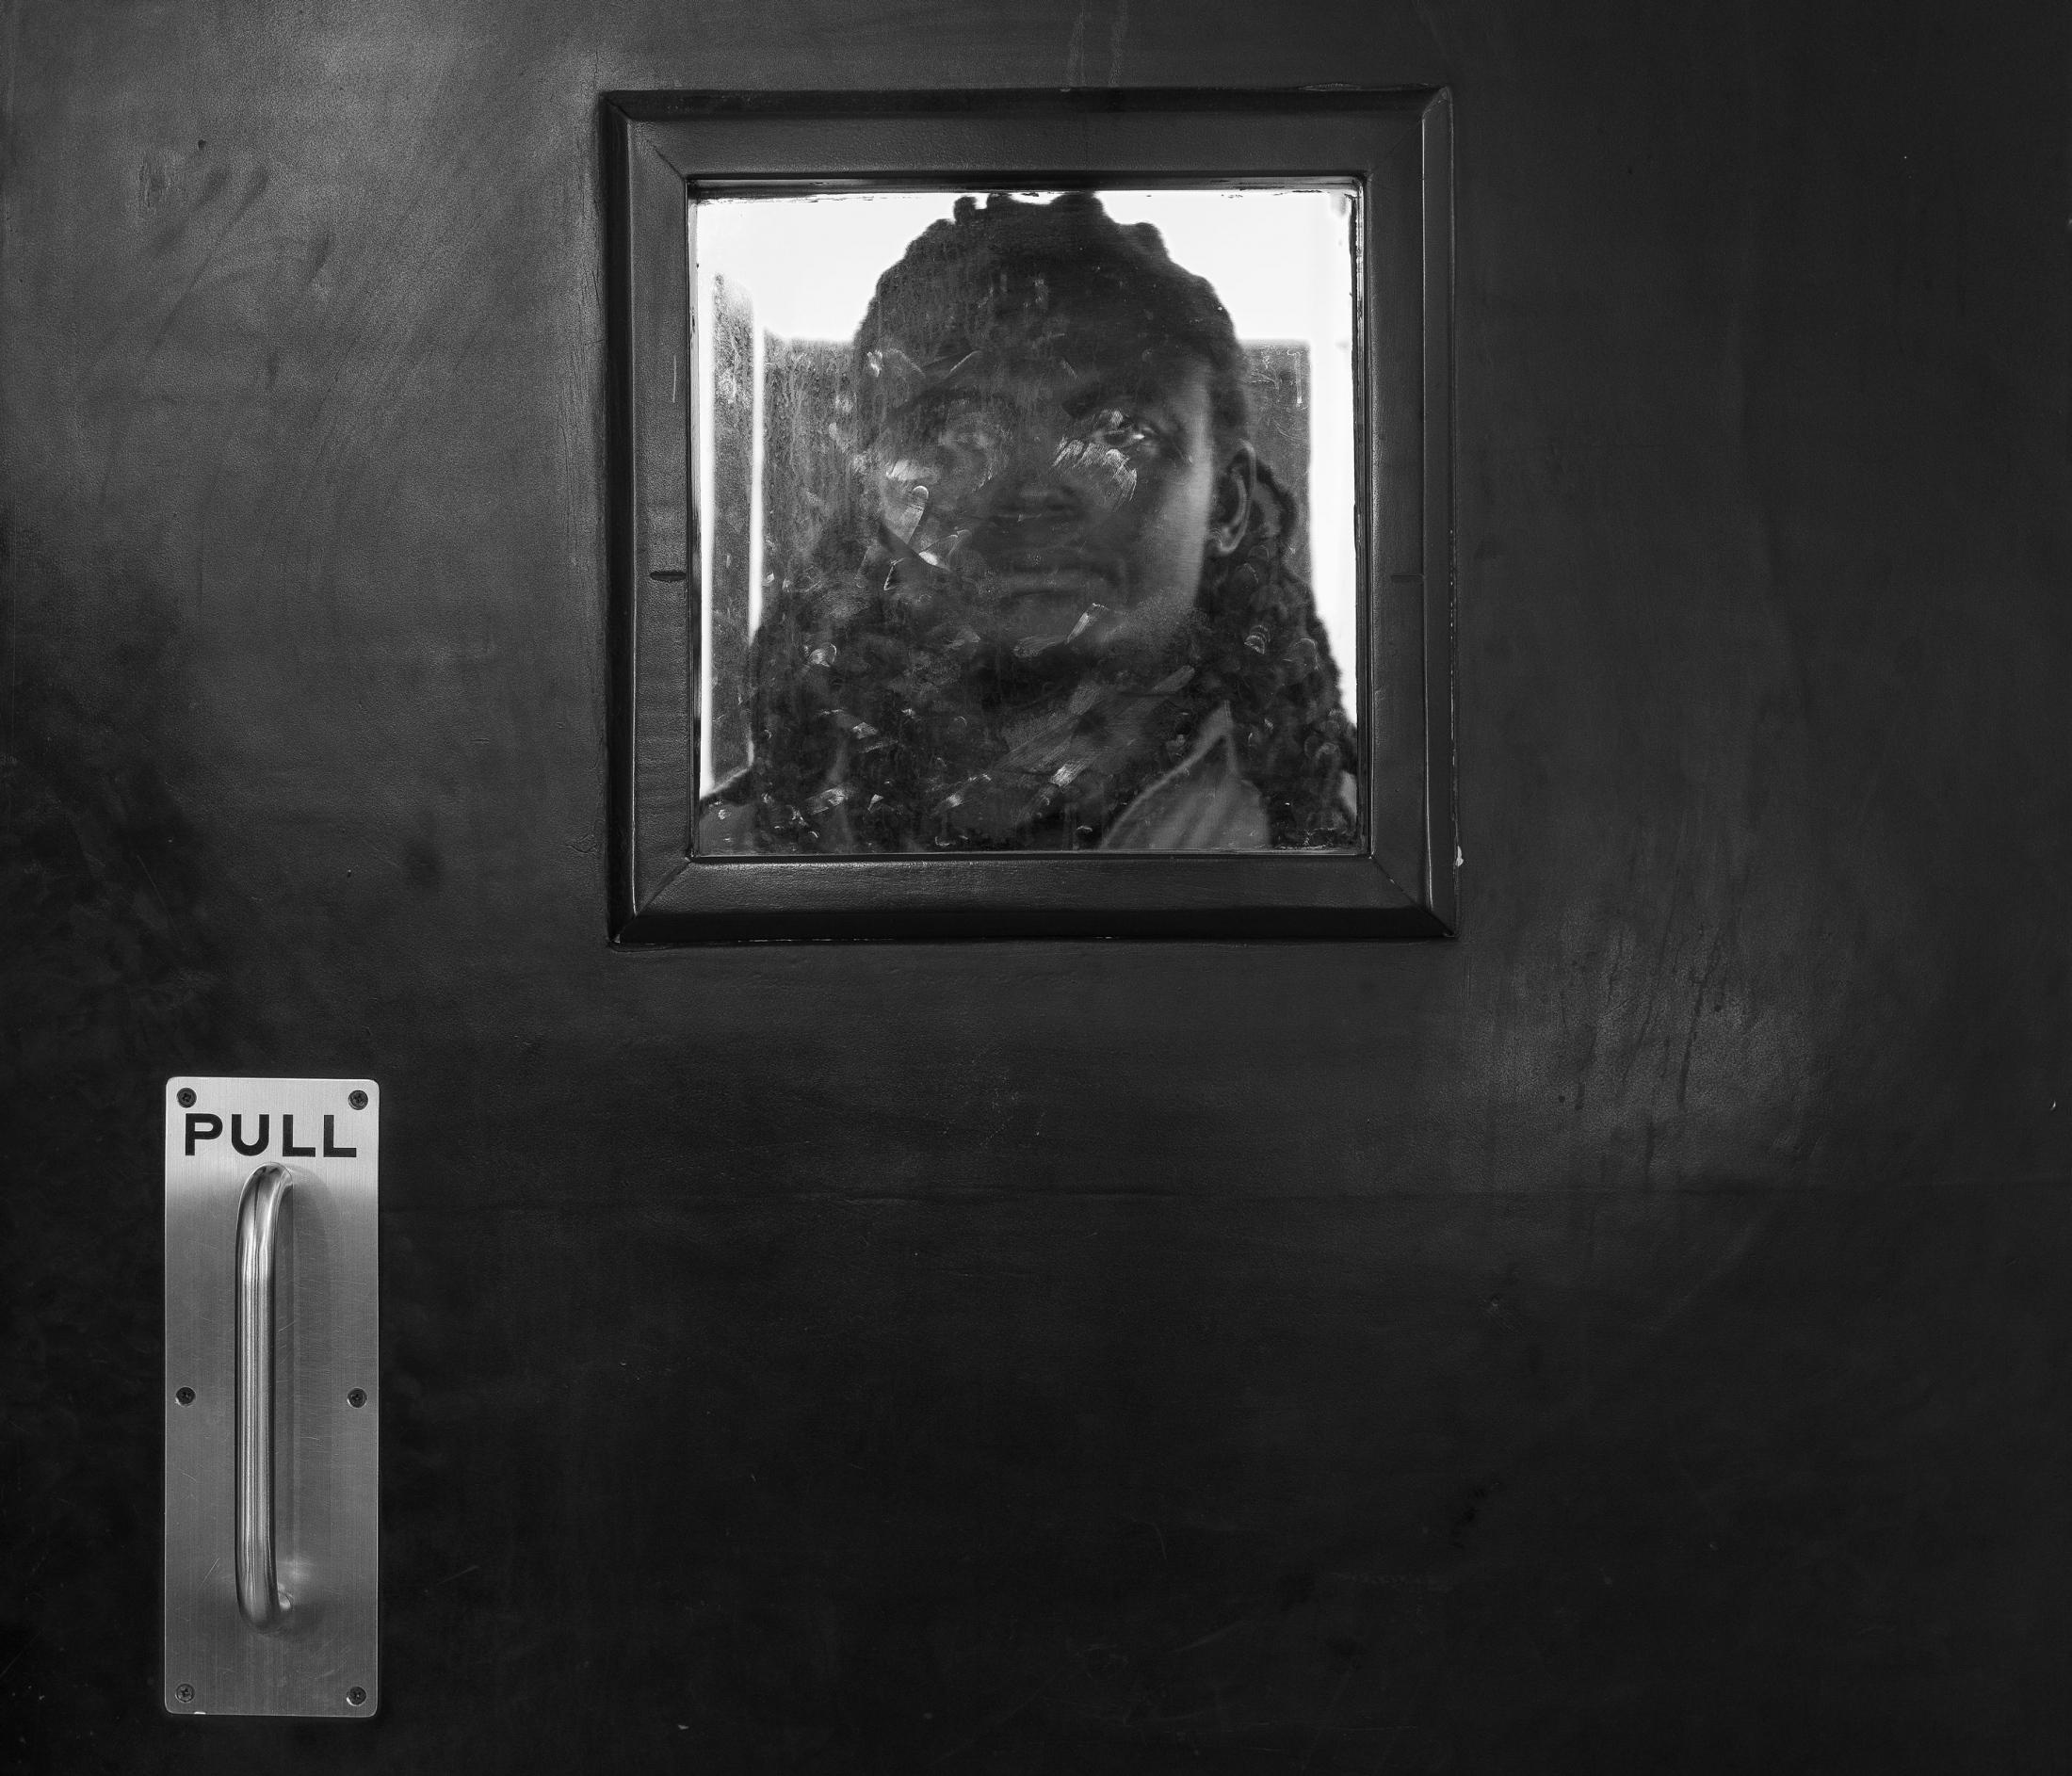 pull, Lagos, 2015